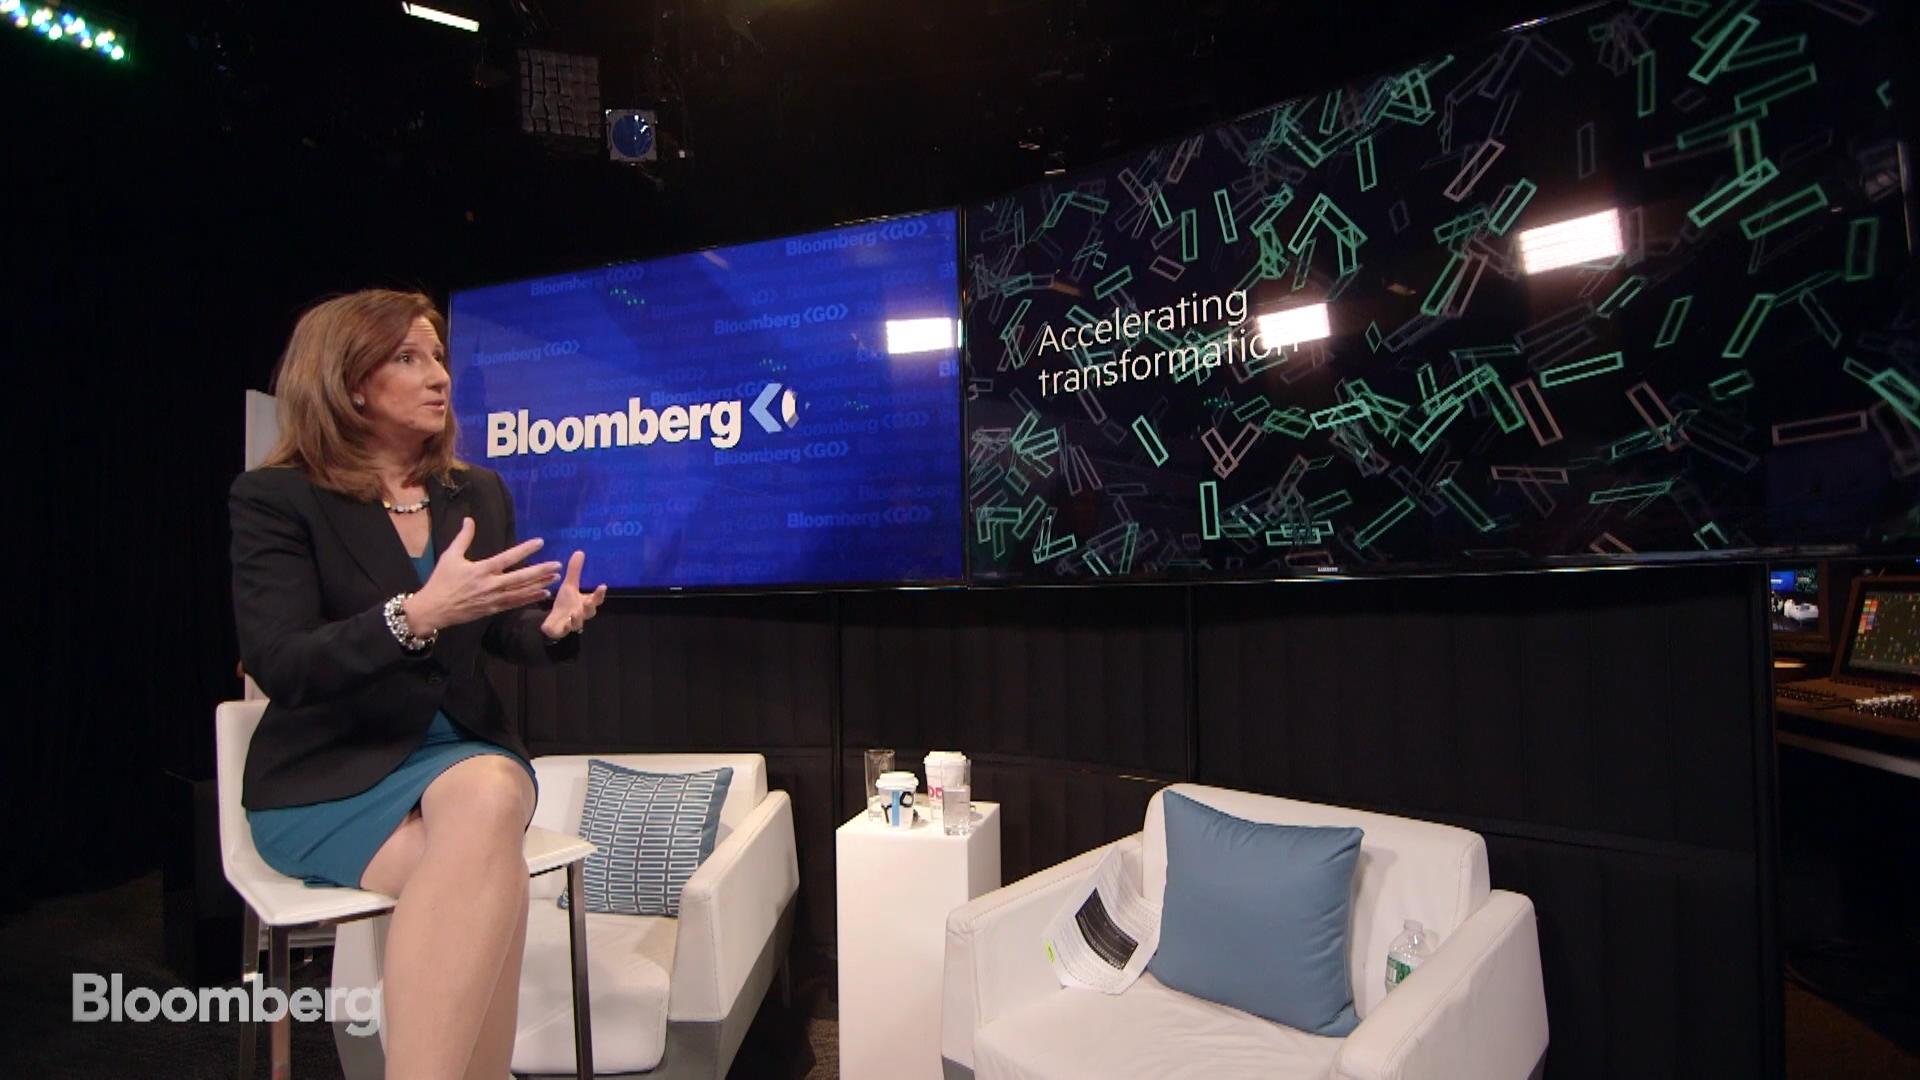 Deloitte CEO Cathy Engelbert: Get A Great Sponsor – Bloomberg